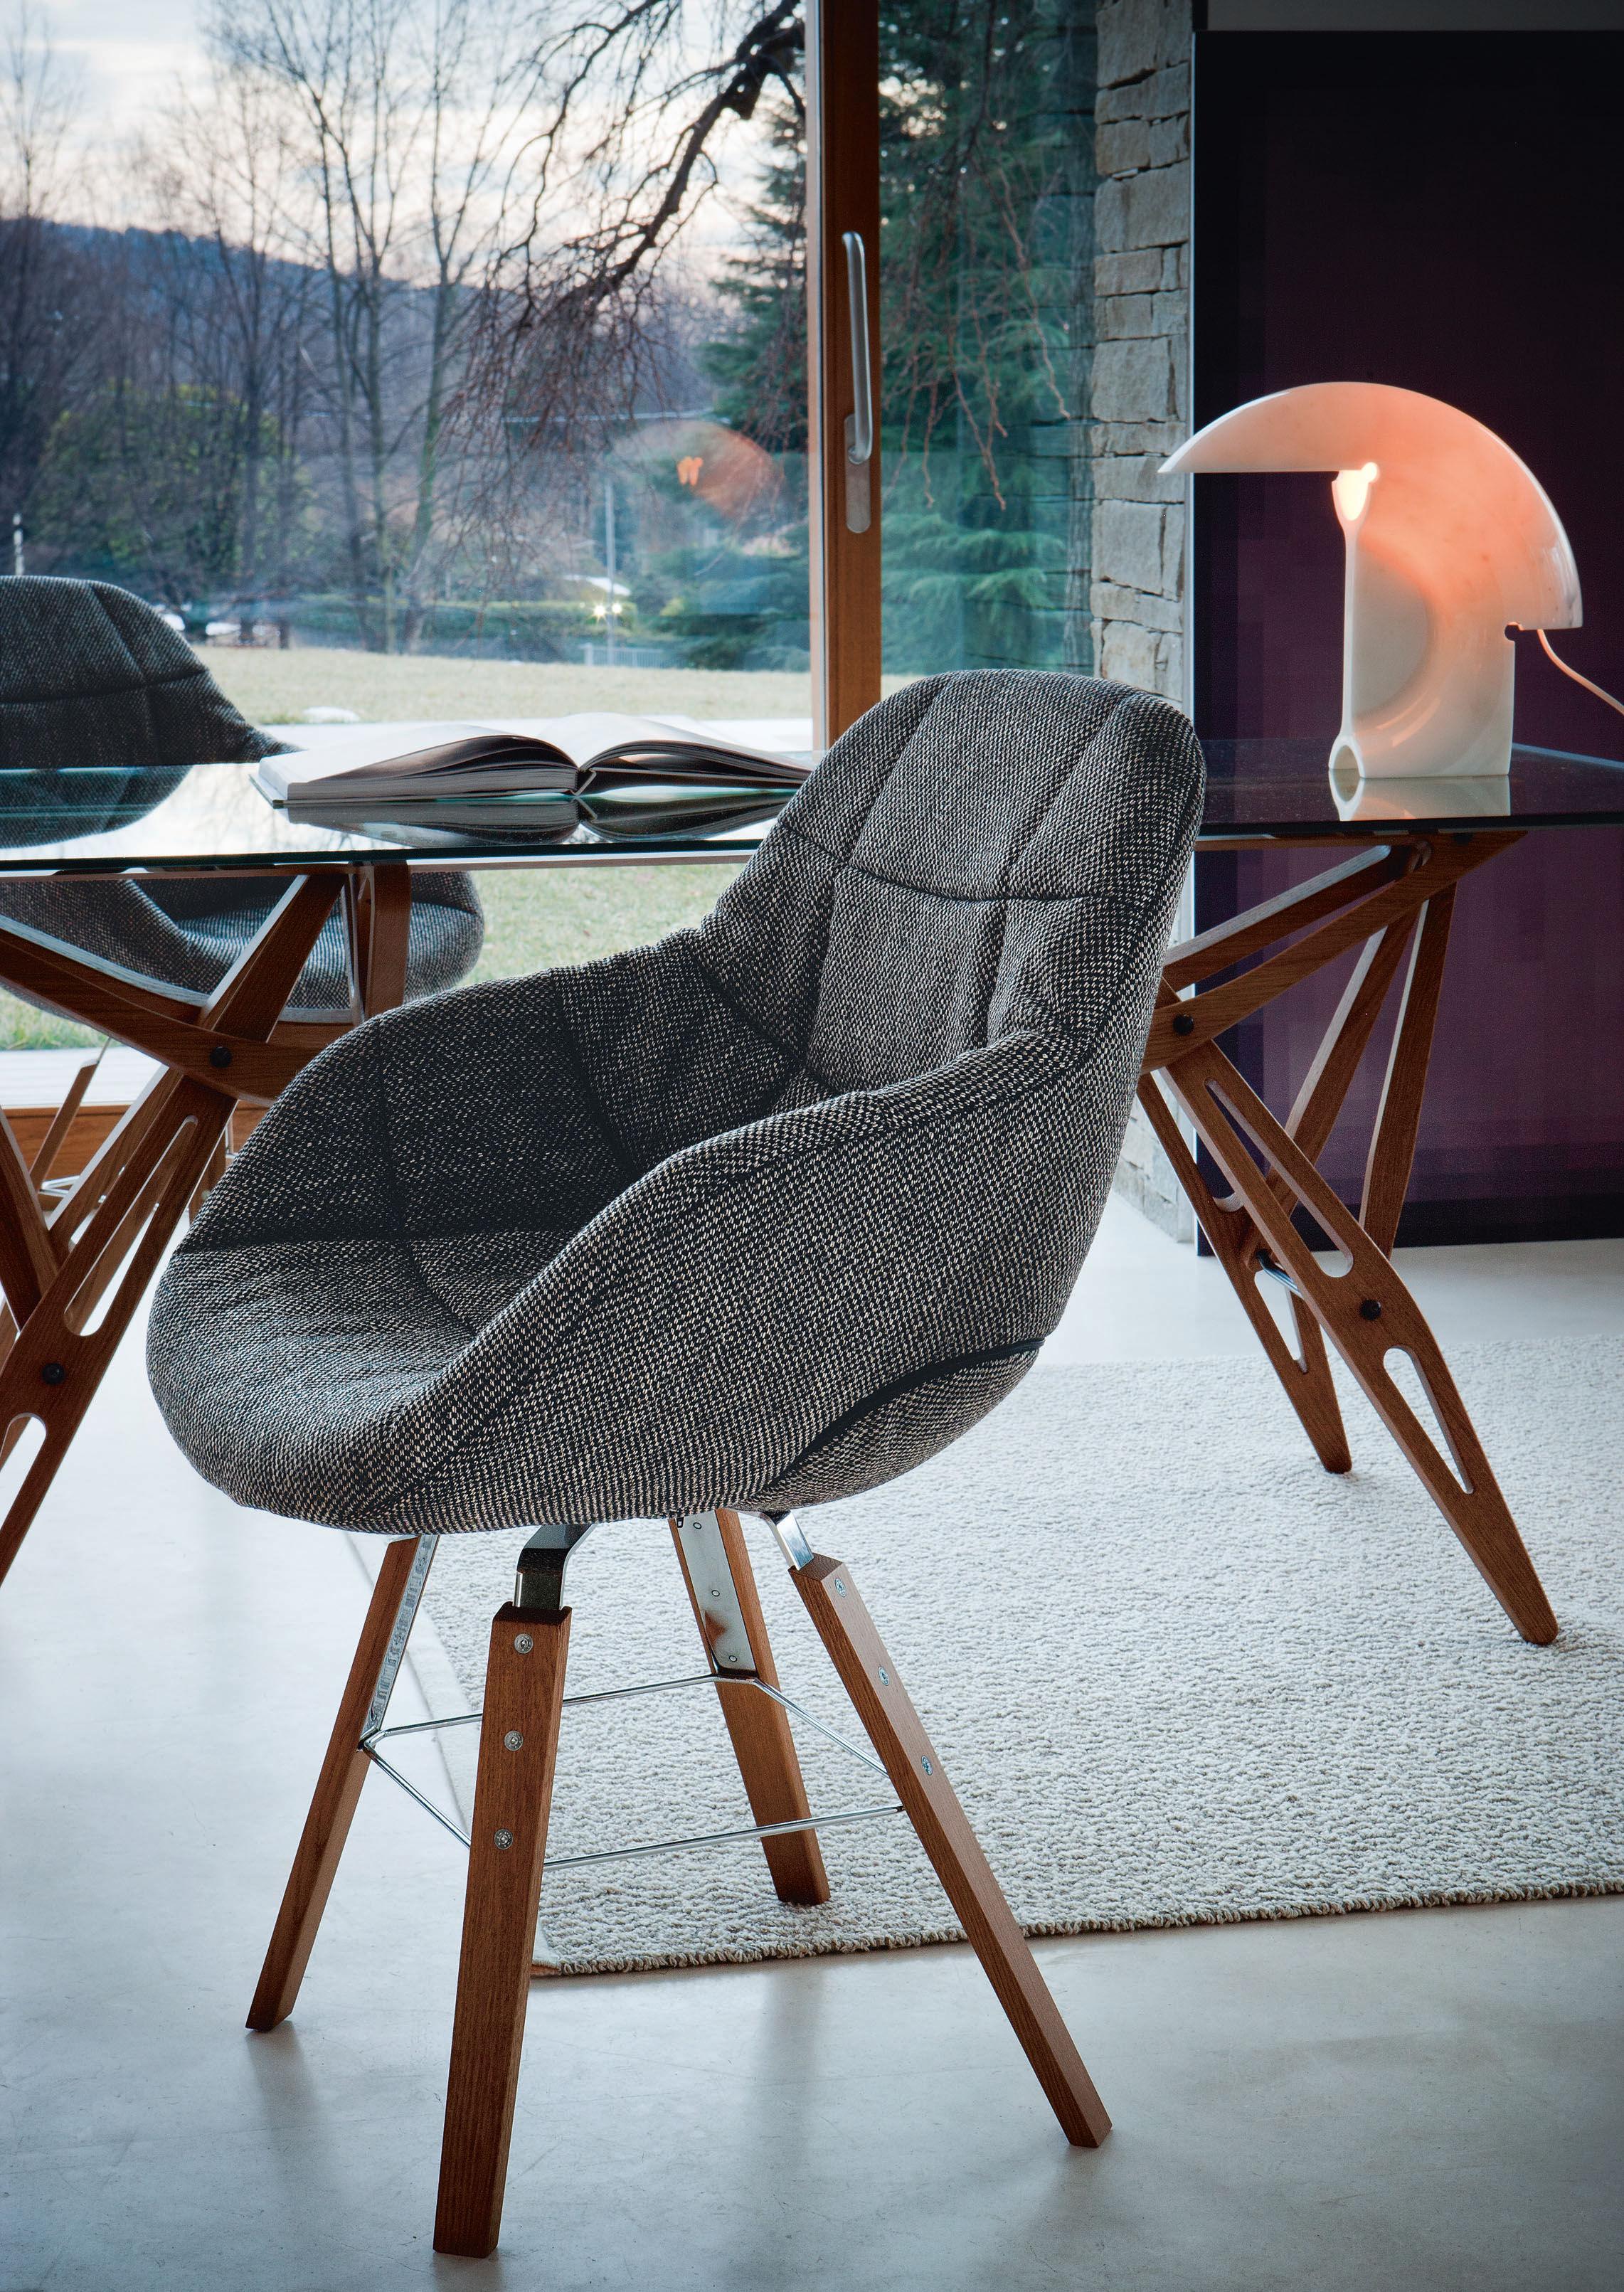 eva 4 stuhlbeine aus holz stoffbezug zanotta gepolsterter sessel. Black Bedroom Furniture Sets. Home Design Ideas